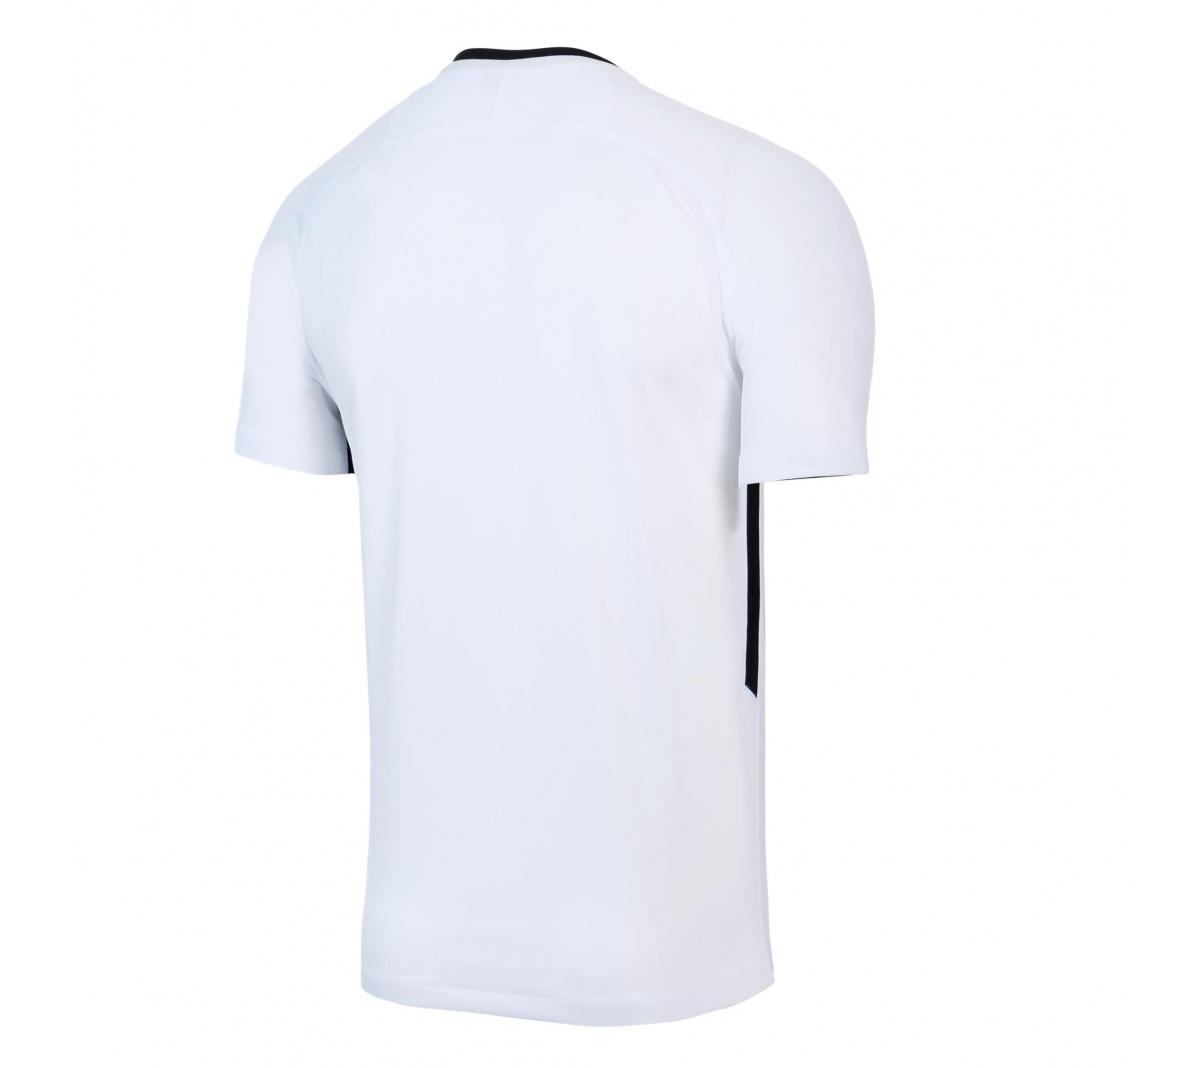 Camisa Nike Corinthians I Oficial 2017/18